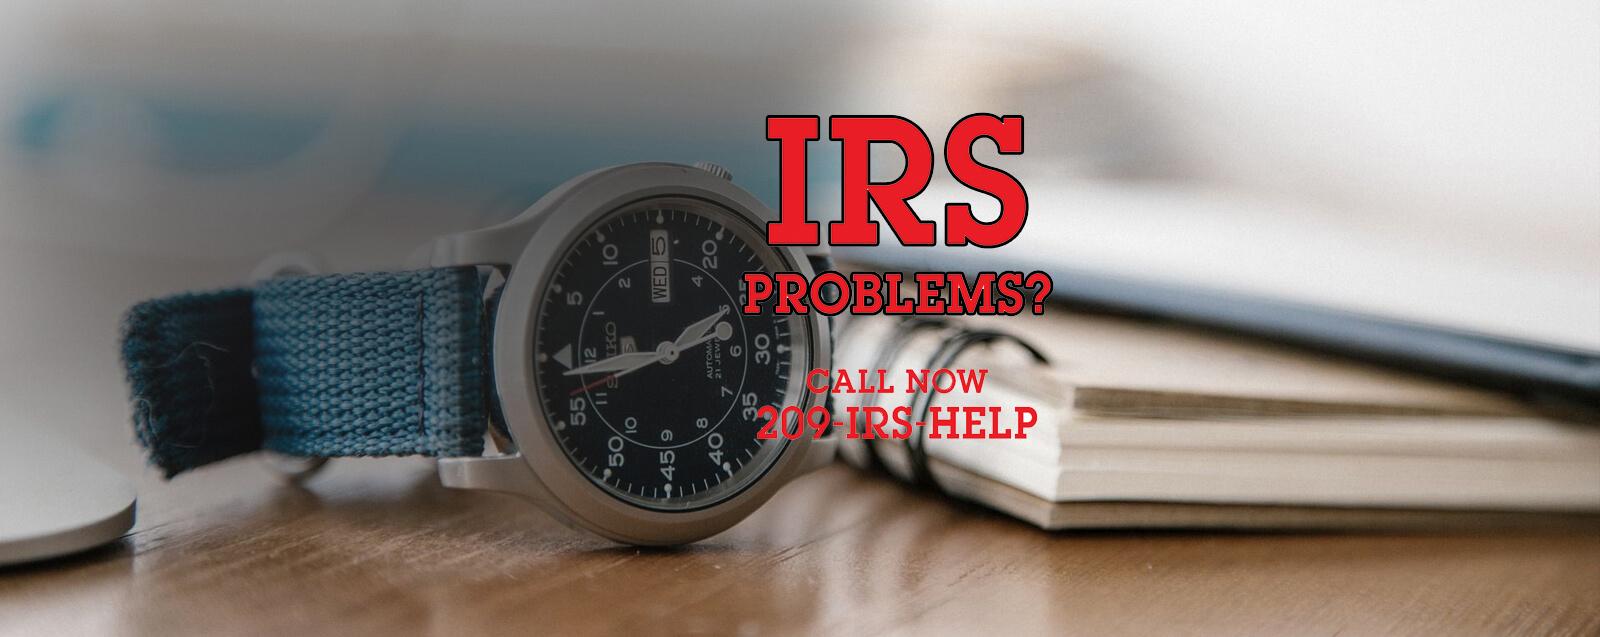 IRS Problems?